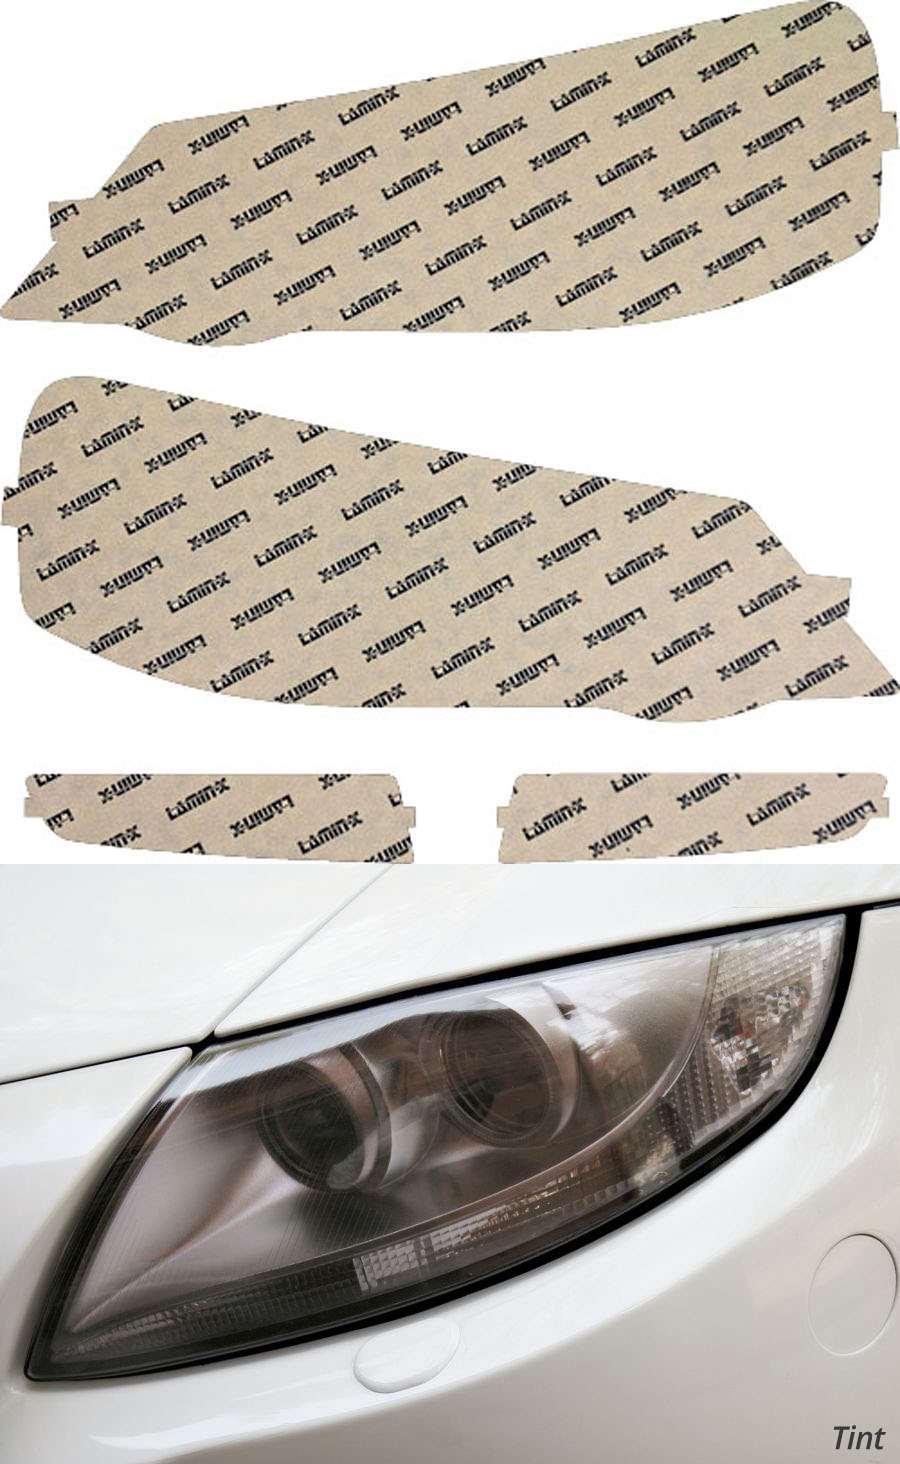 Acura TL Sedan 02-03 Tint Headlight Covers Lamin-X AC405T